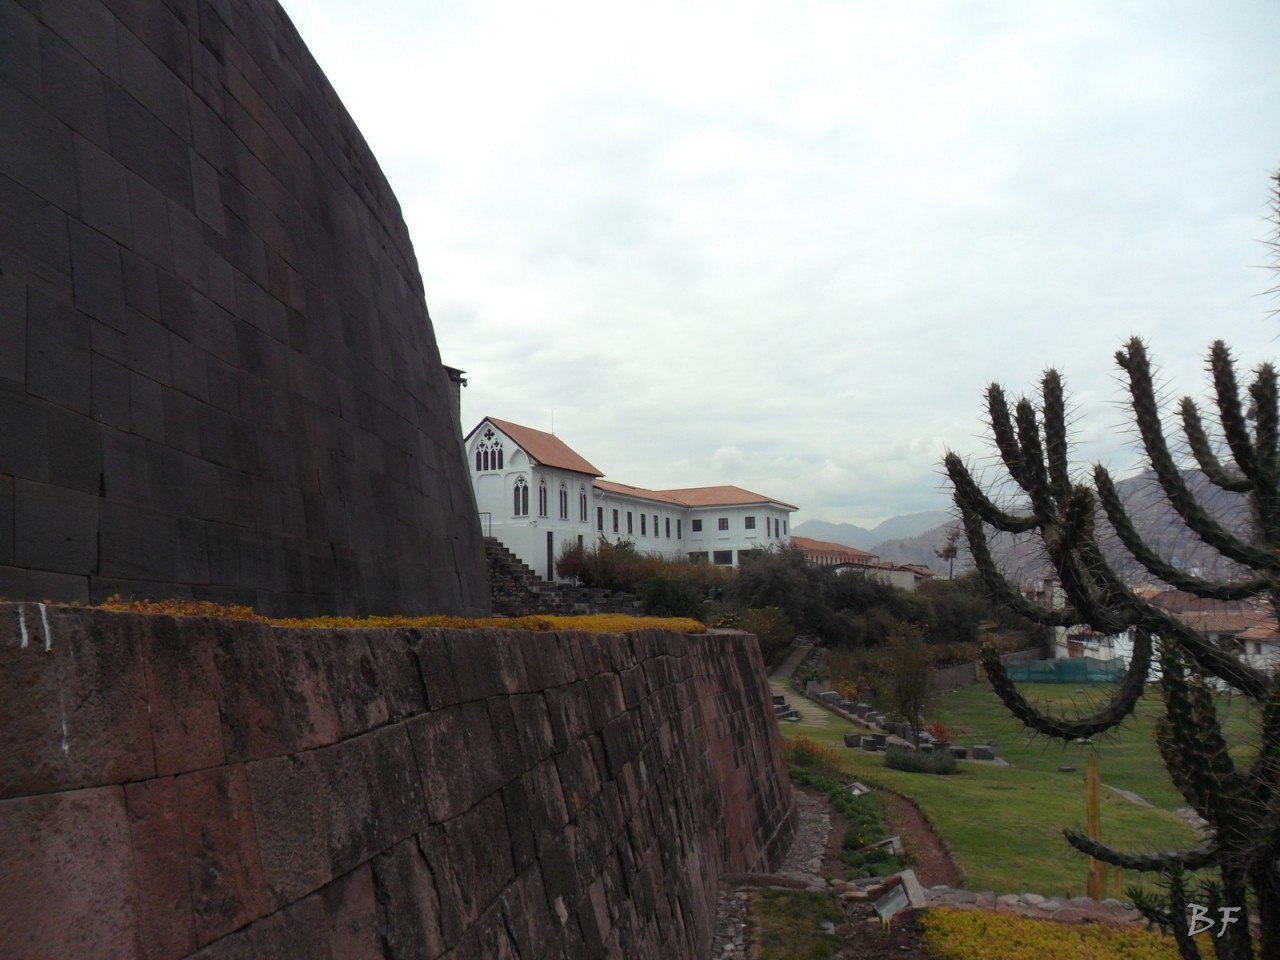 1_Mura-Poligonali-Megaliti-Tempio-Coricancha-Cusco-Perù-9